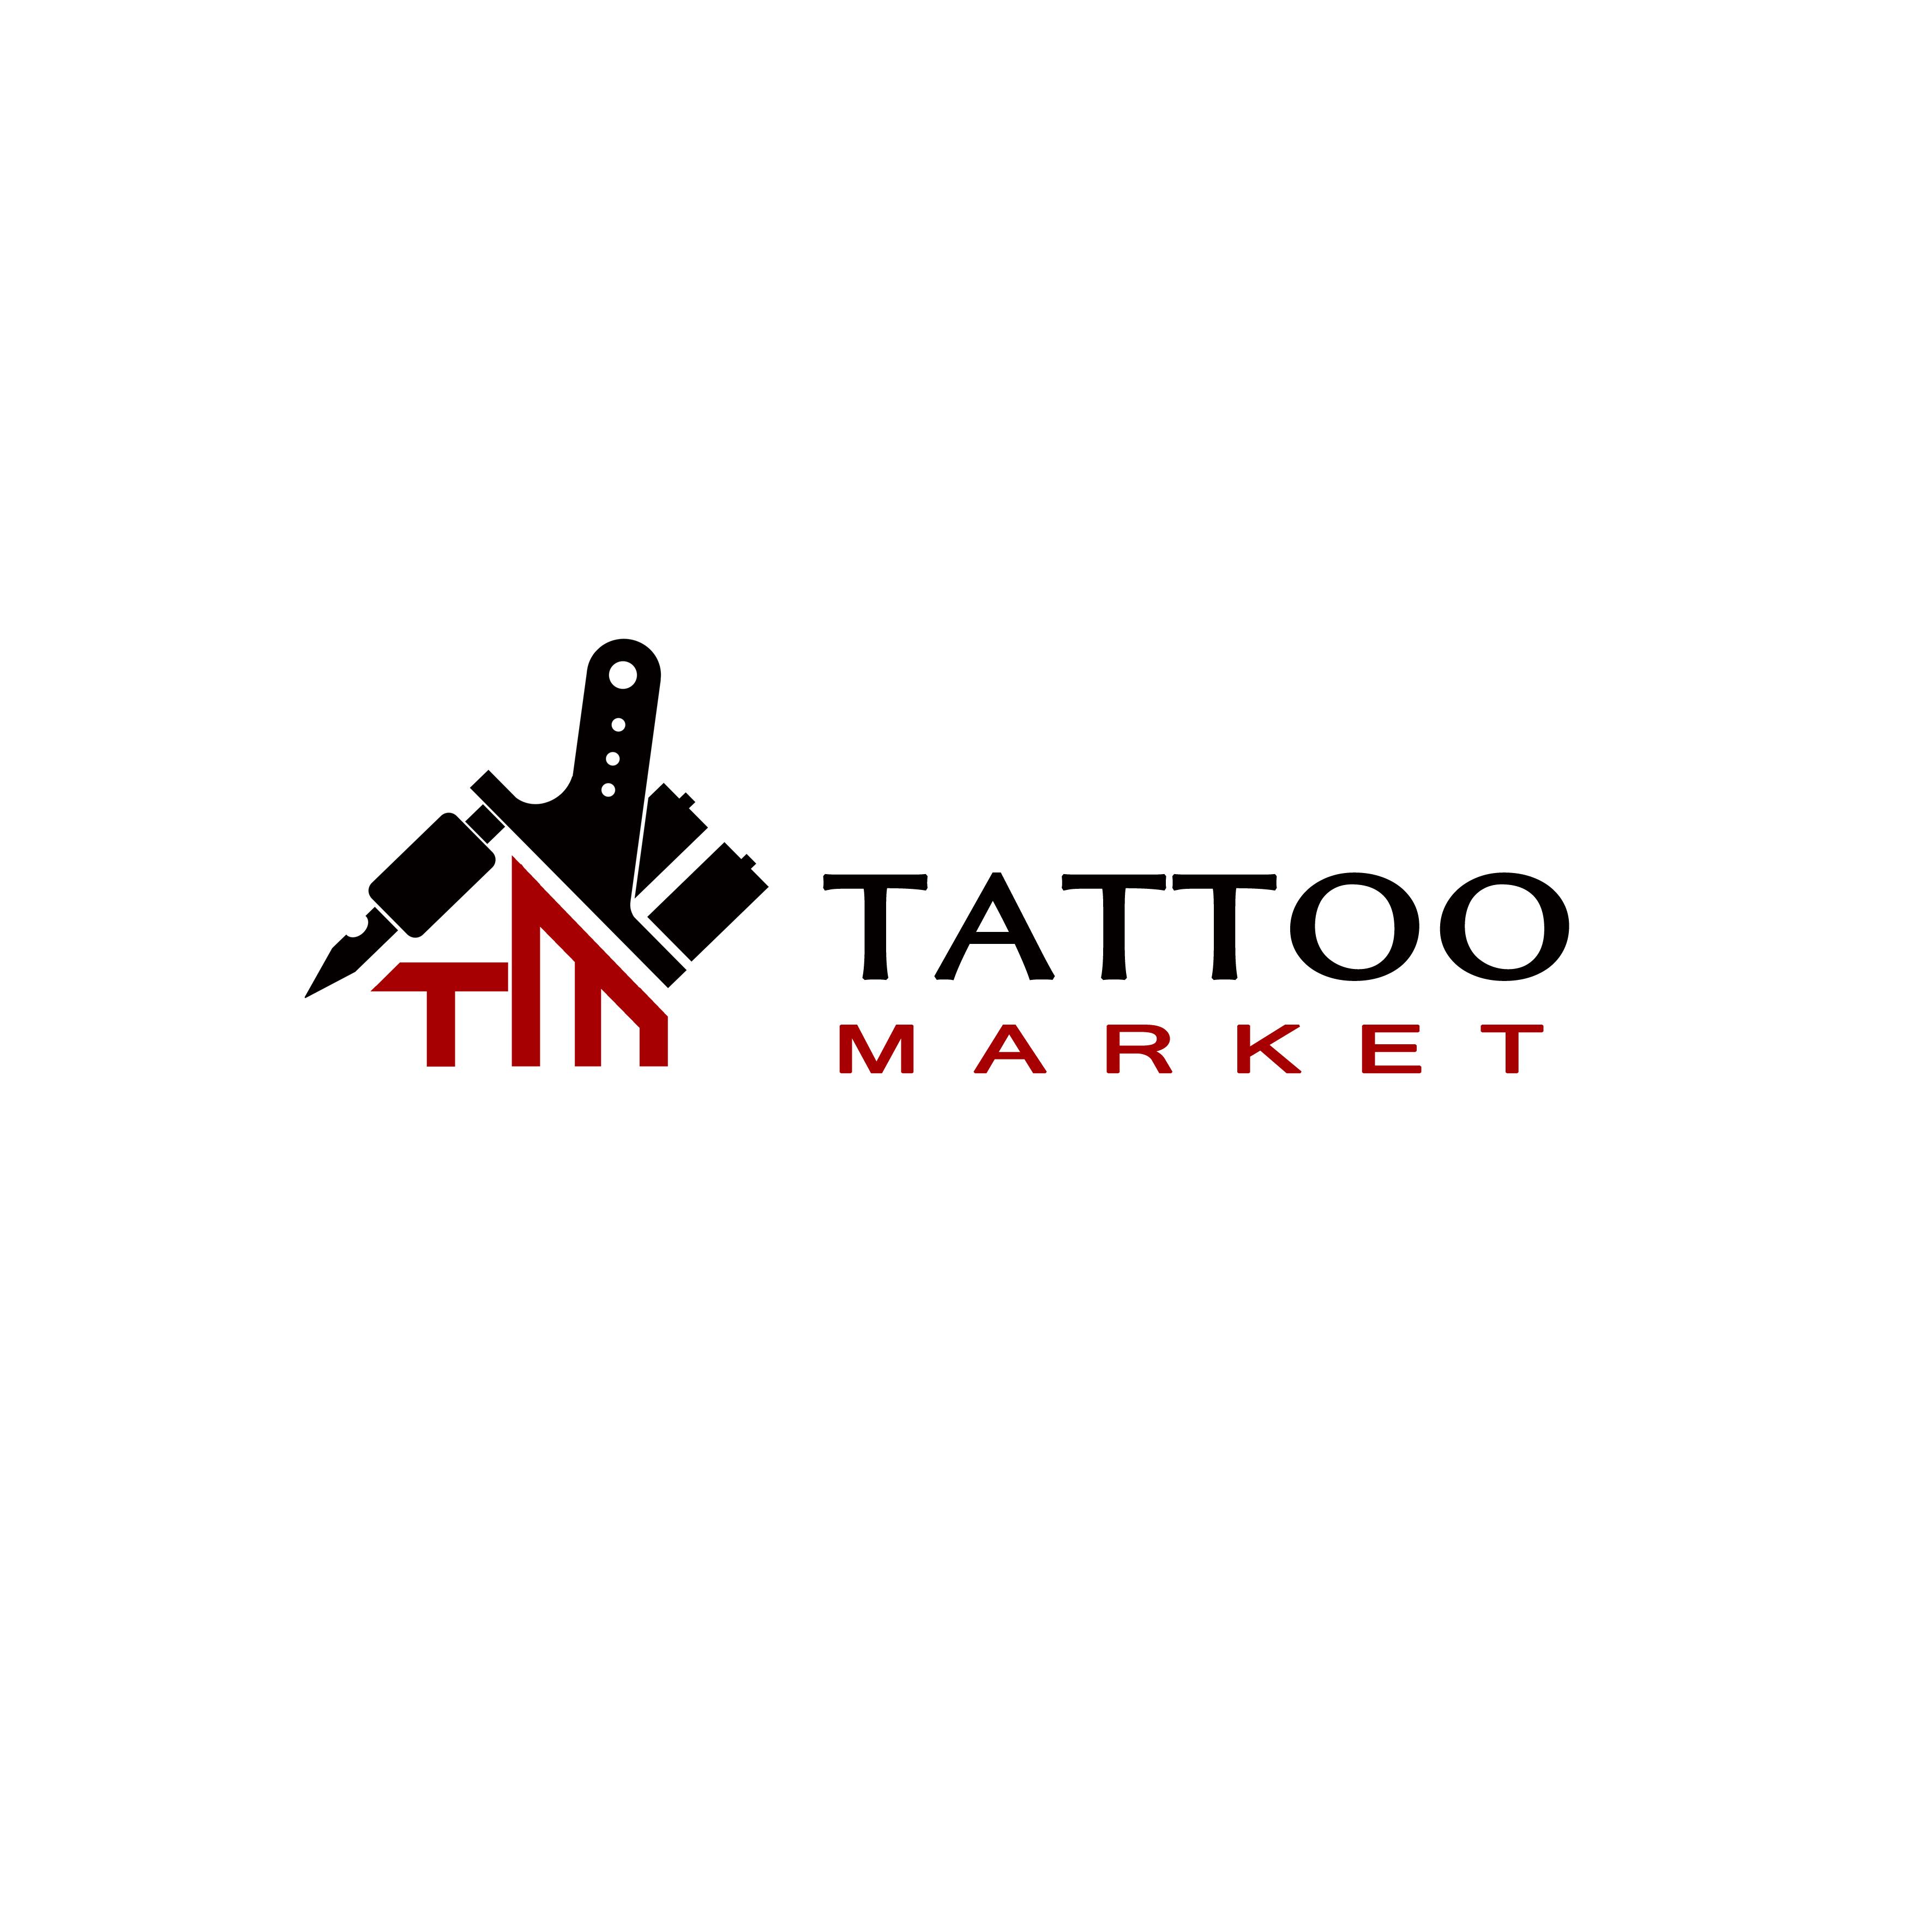 Редизайн логотипа магазина тату оборудования TattooMarket.ru фото f_8815c40ab7856dfe.jpg